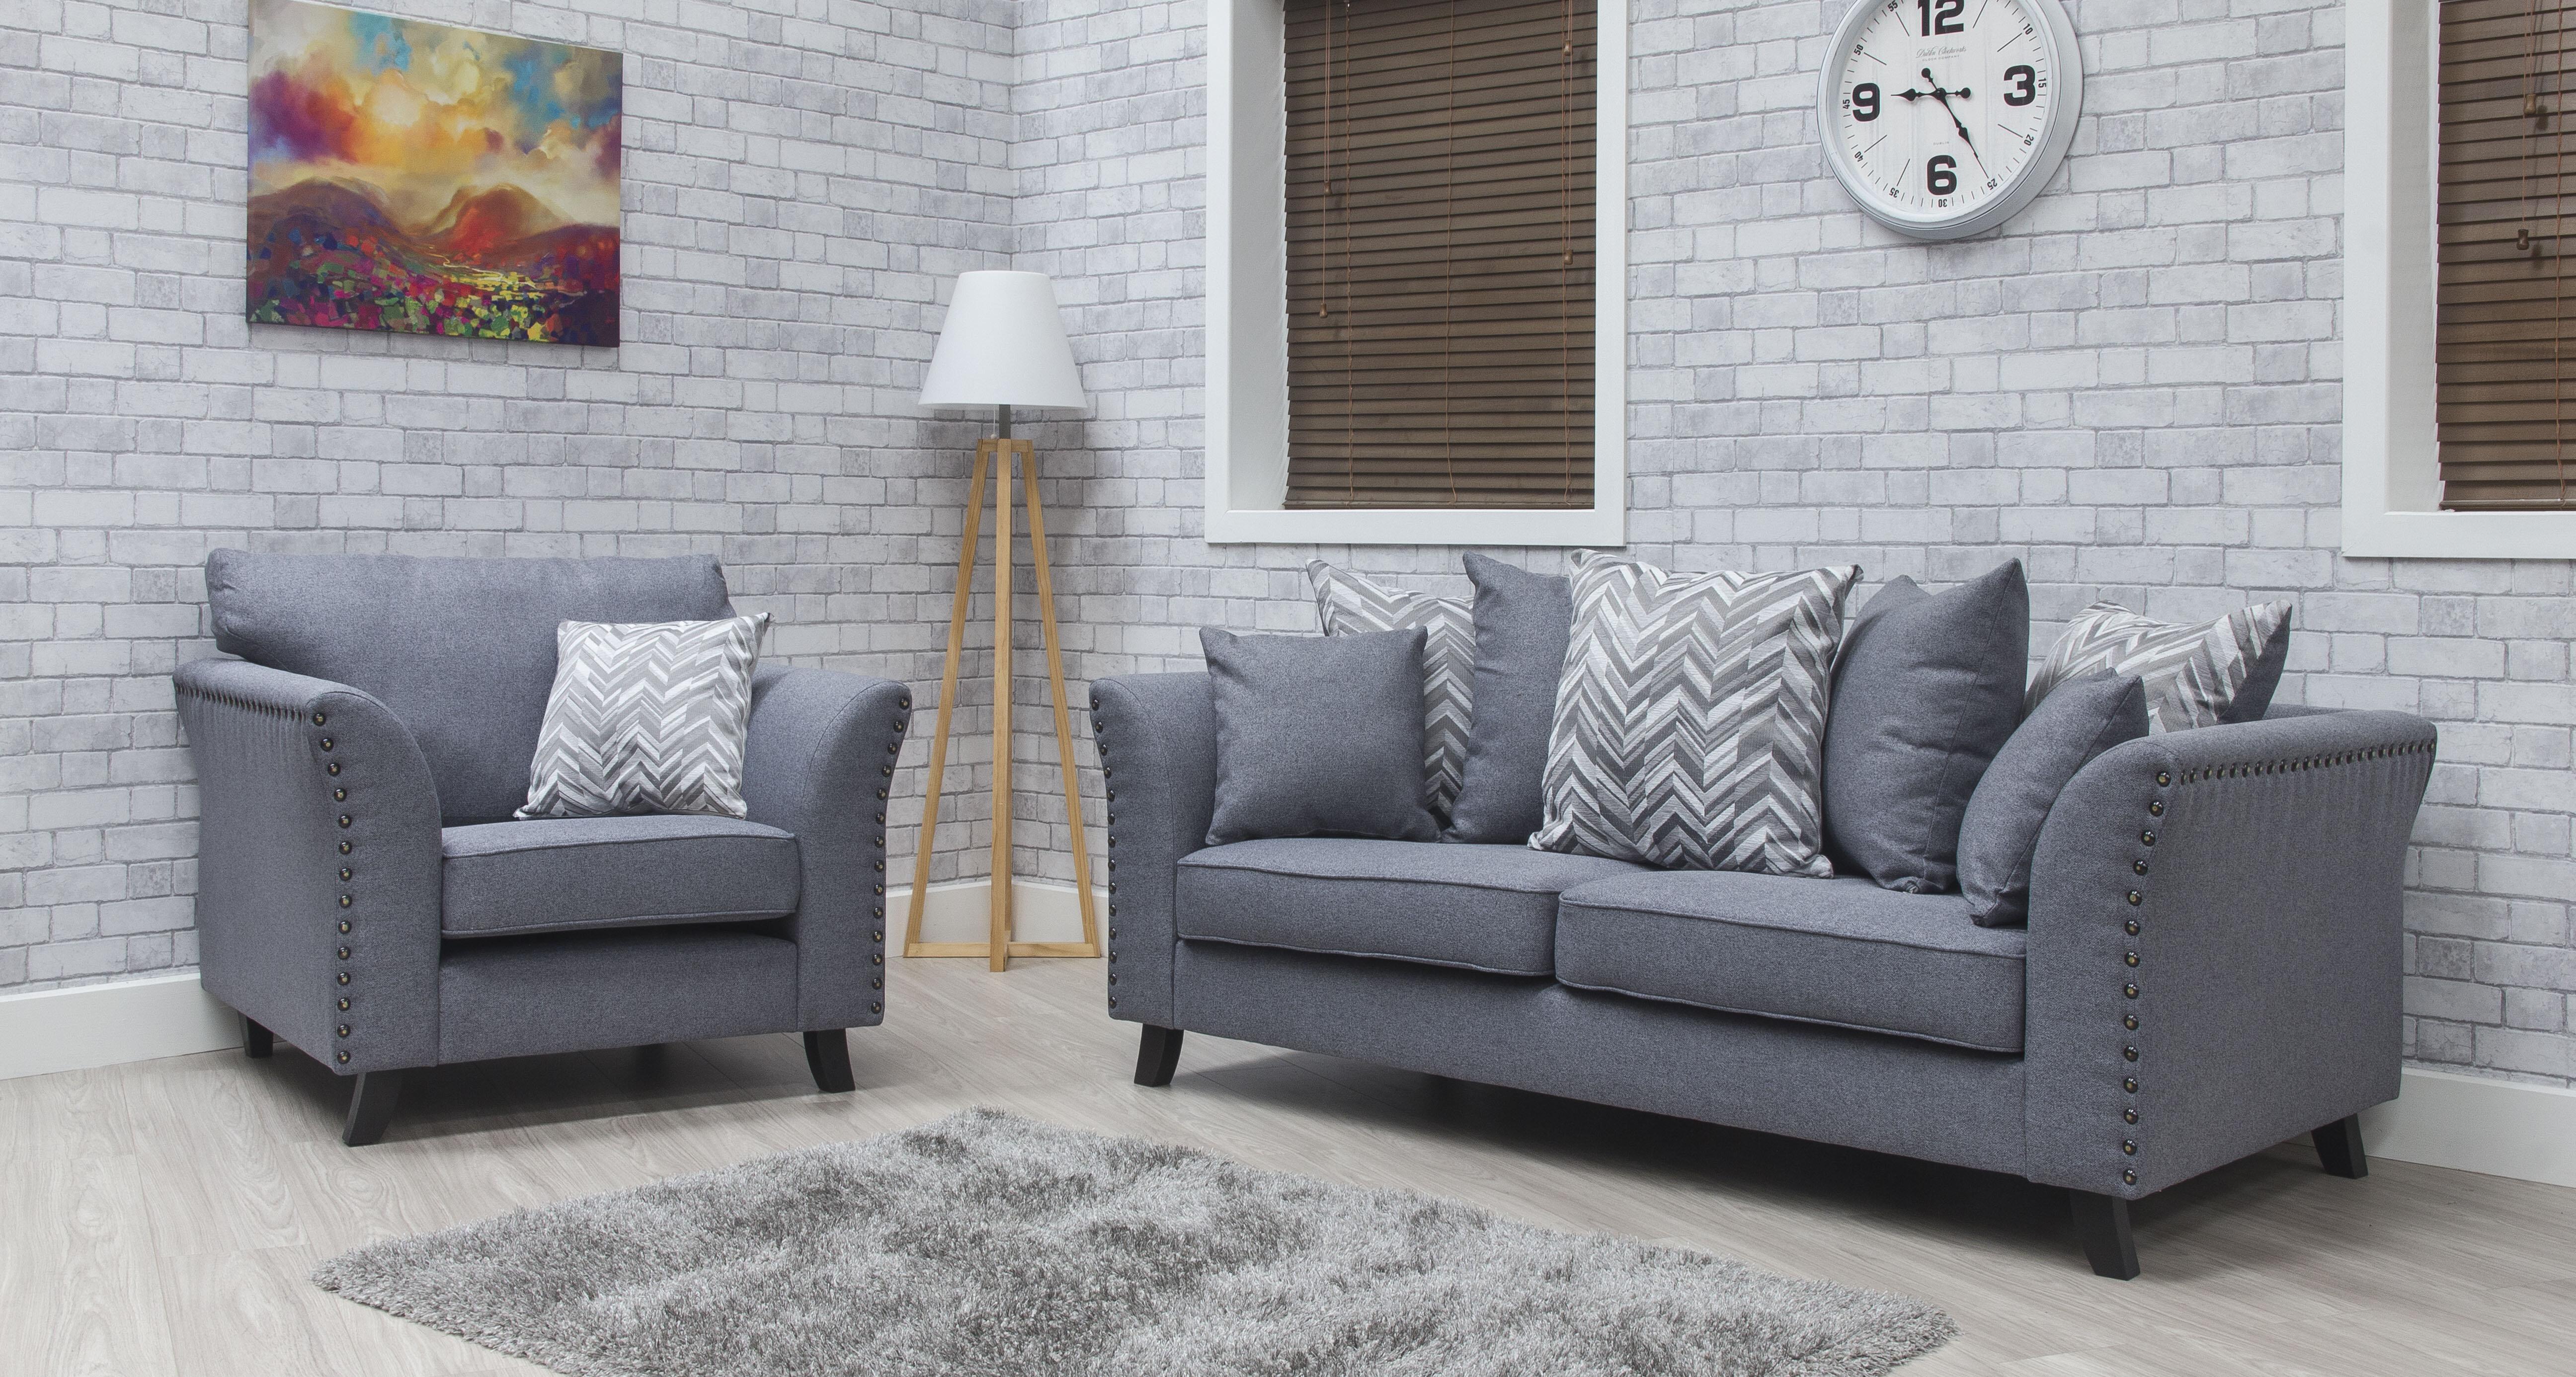 Cassia Fabric Sofa - Steel 2